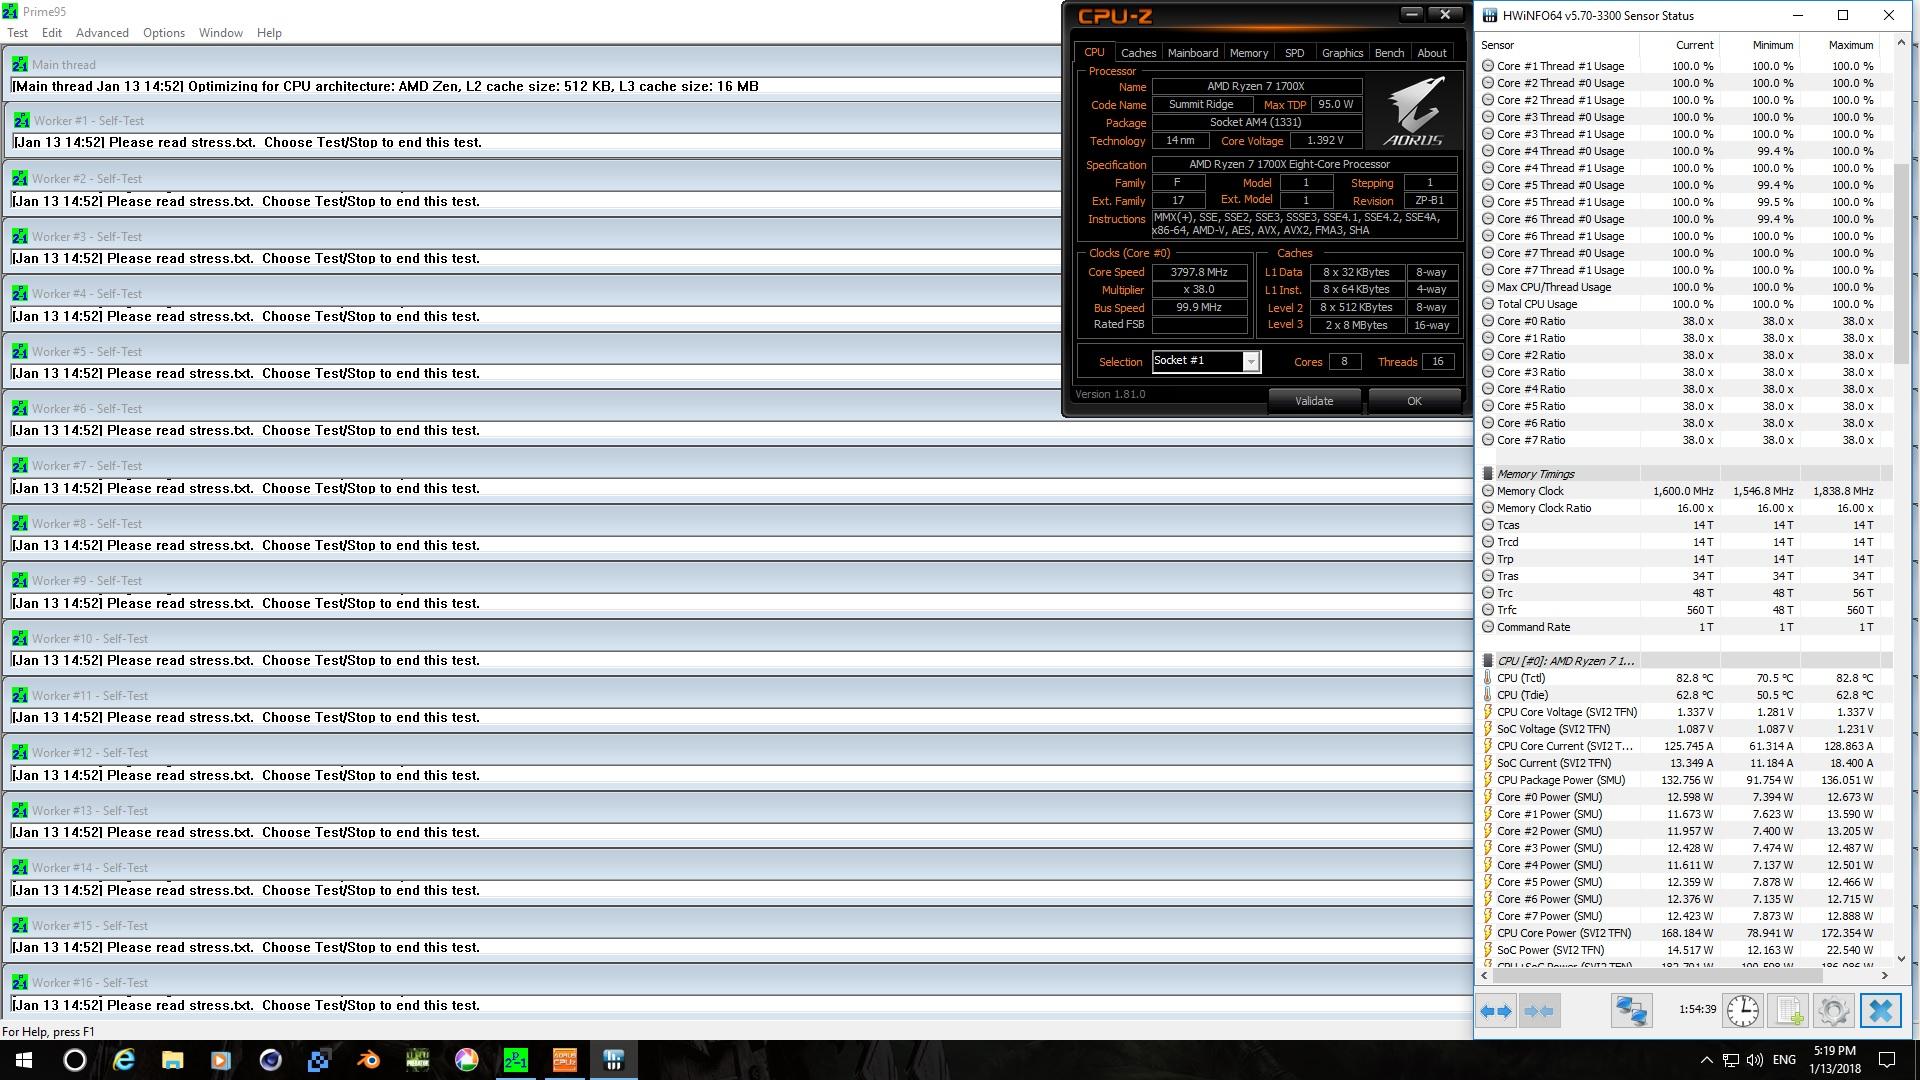 Ryzen 7 1700X @ 3.8GHz Prime95 score.jpg